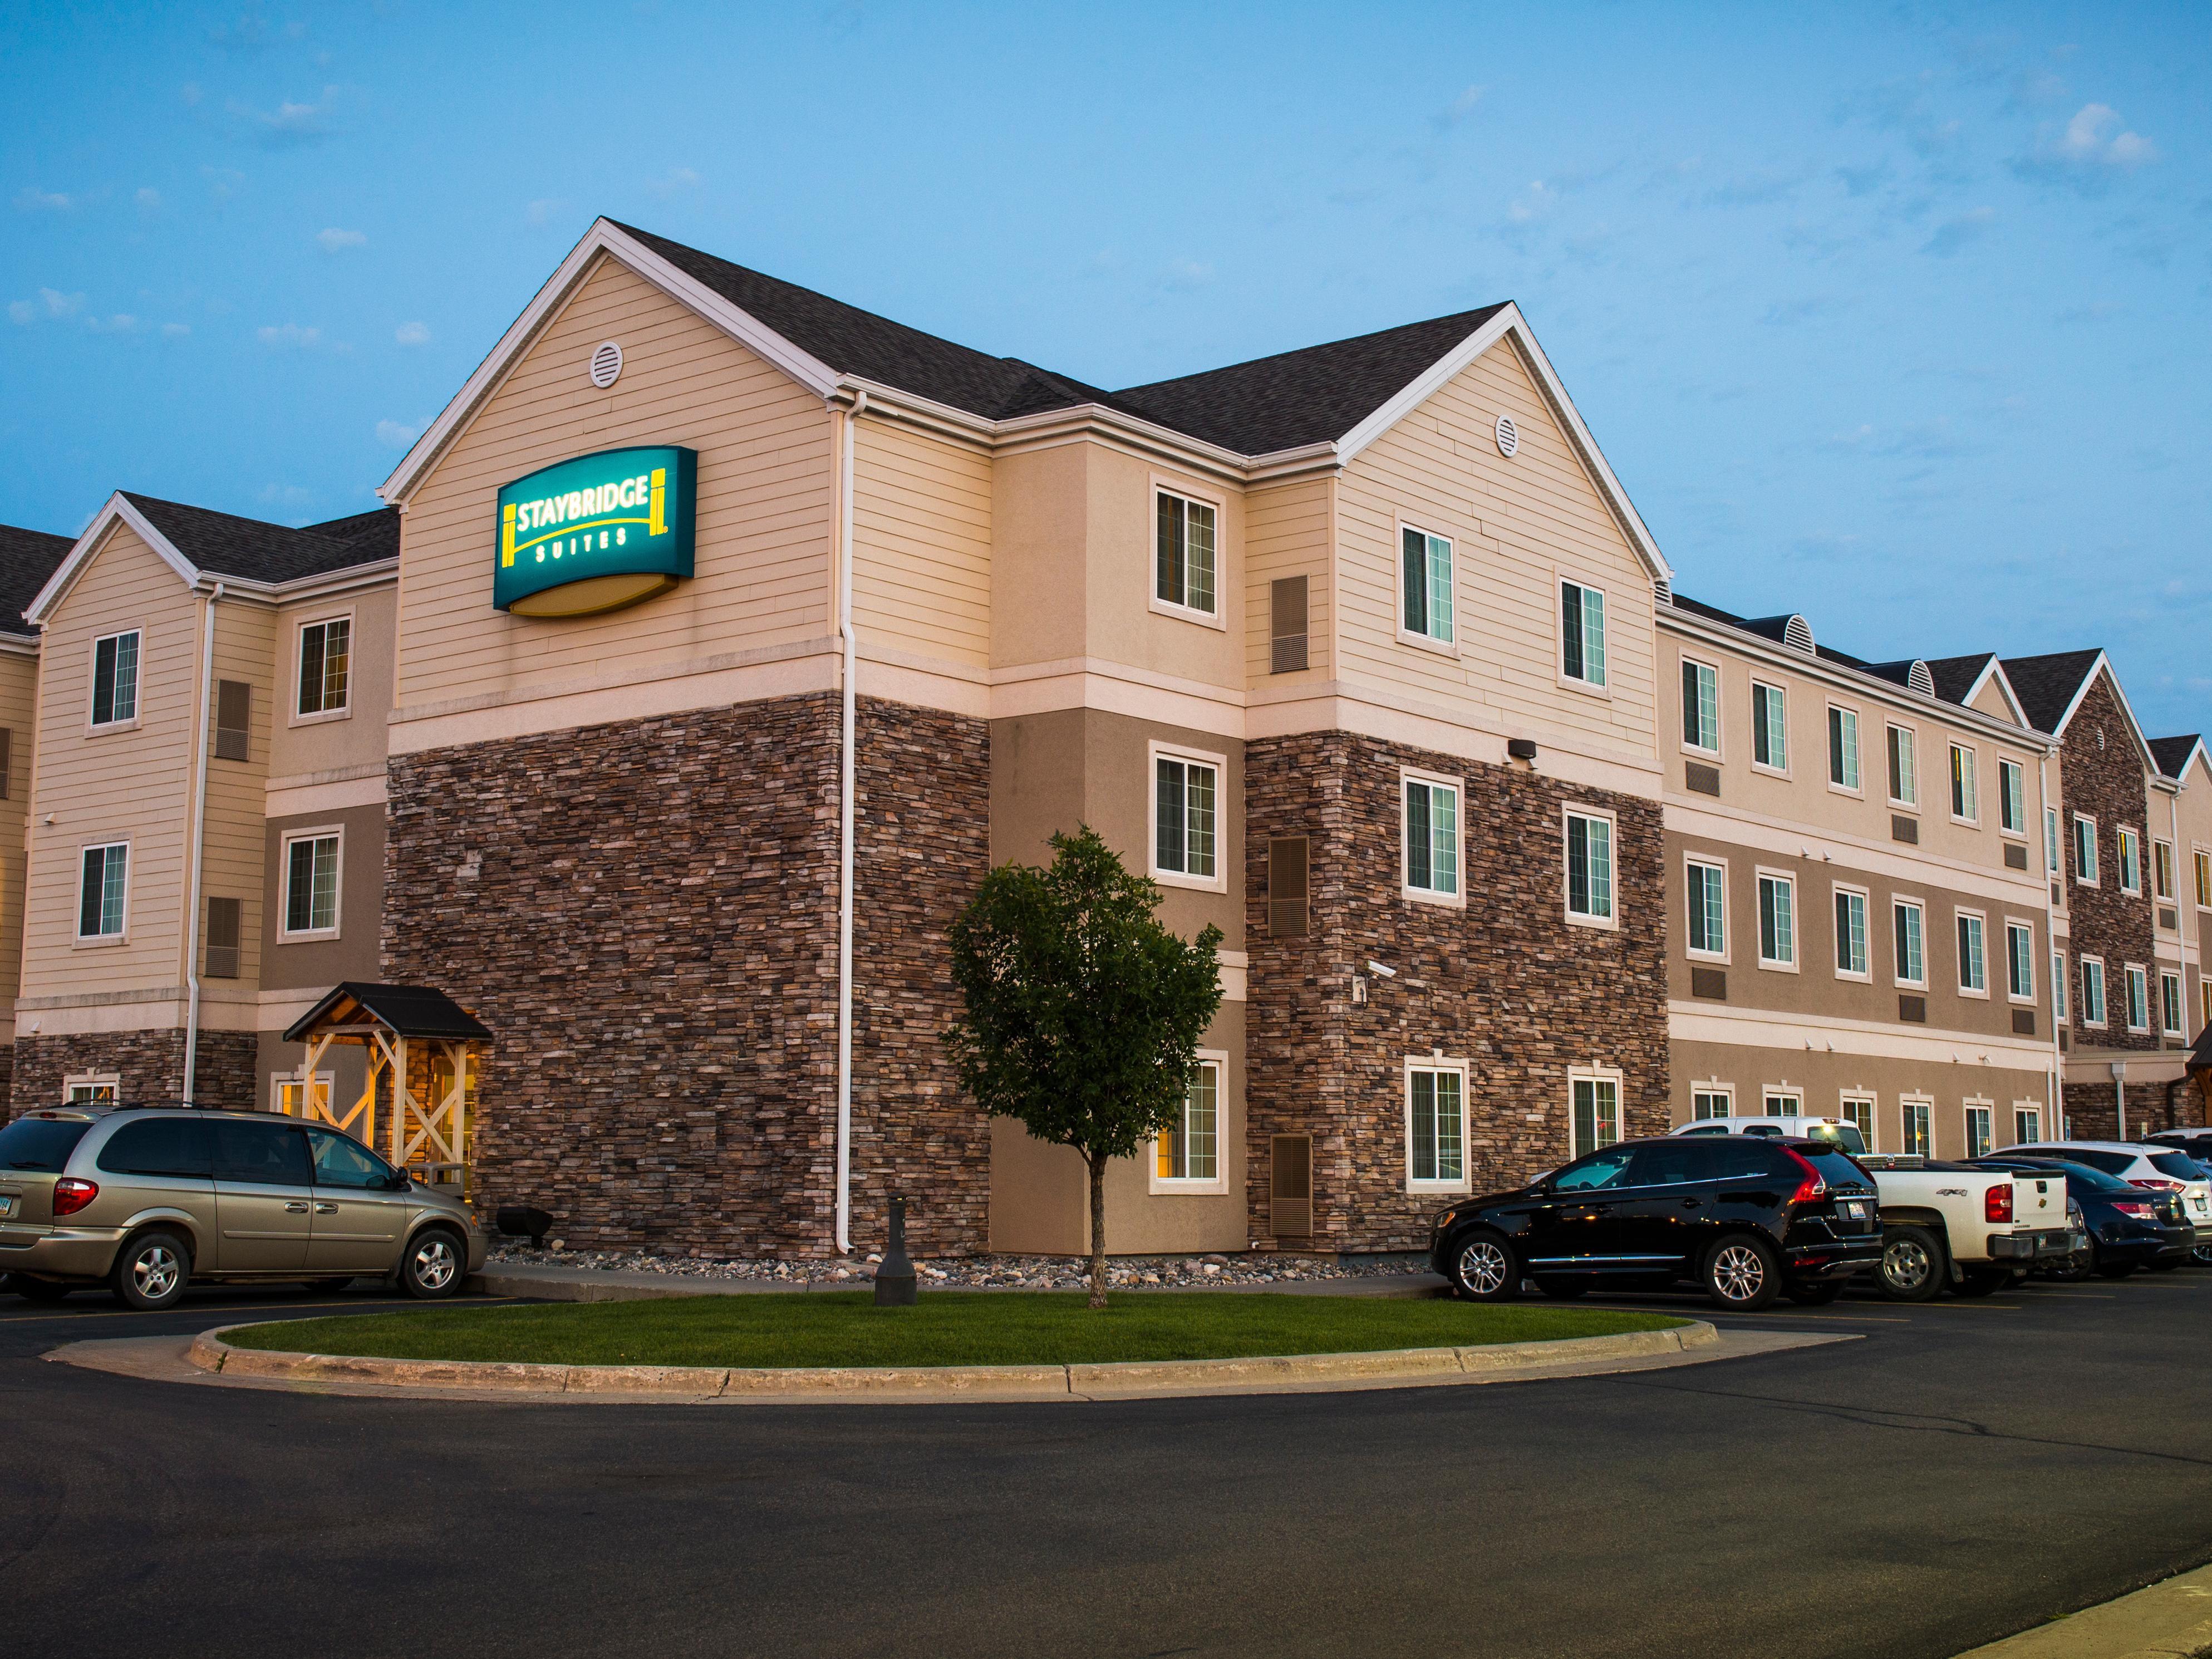 Fargo Extended Stay Hotels